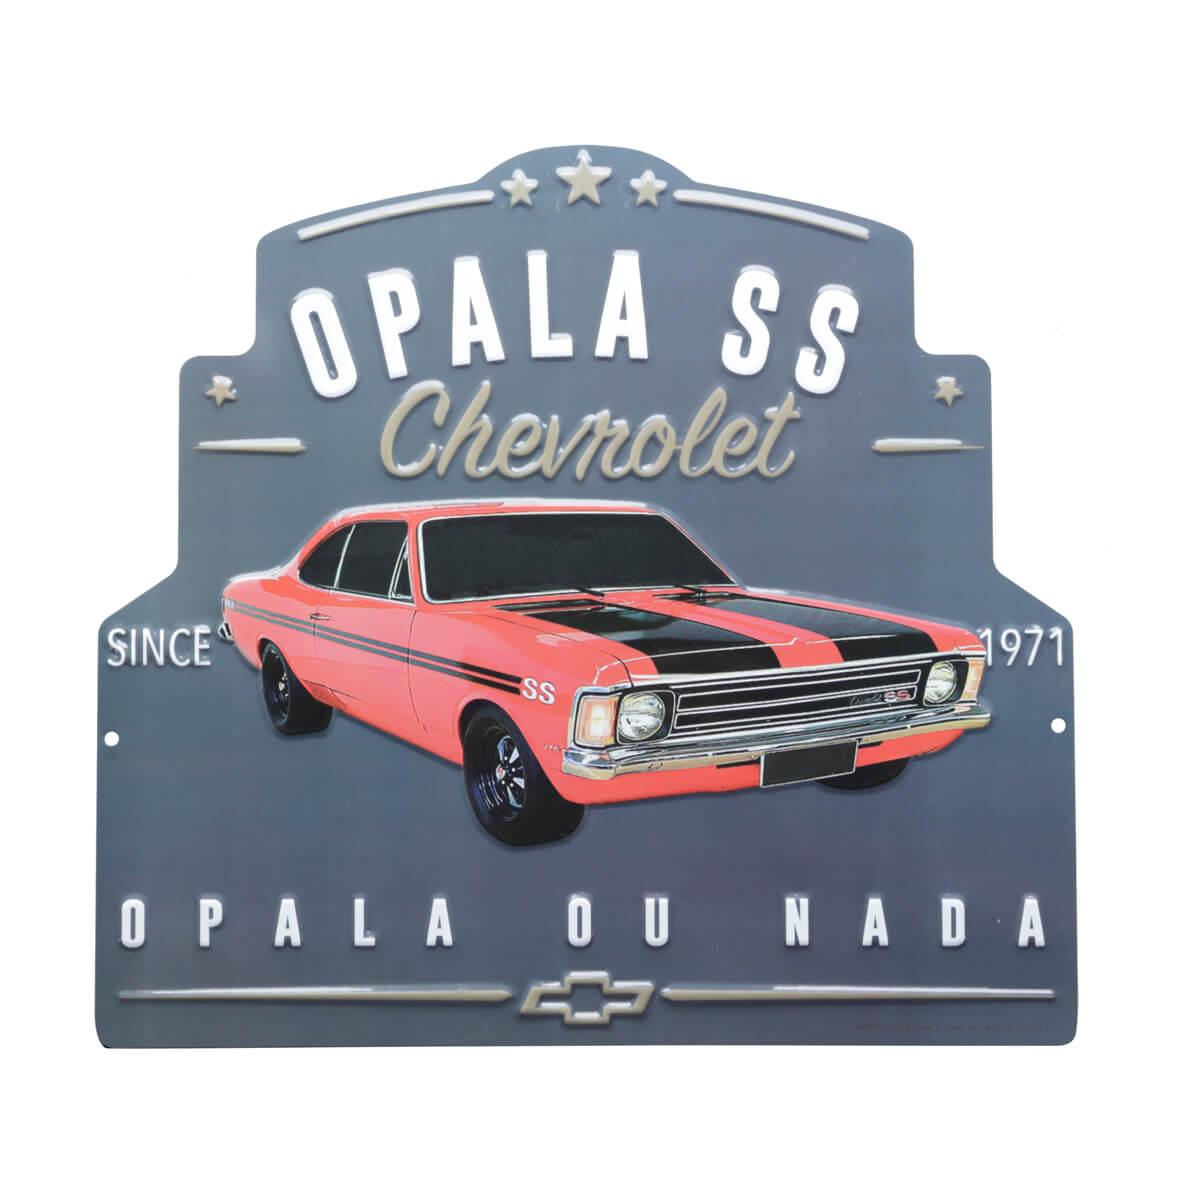 Placa de Alumínio com Recorte Chevrolet - Opala 1971 - Prata / Laranja